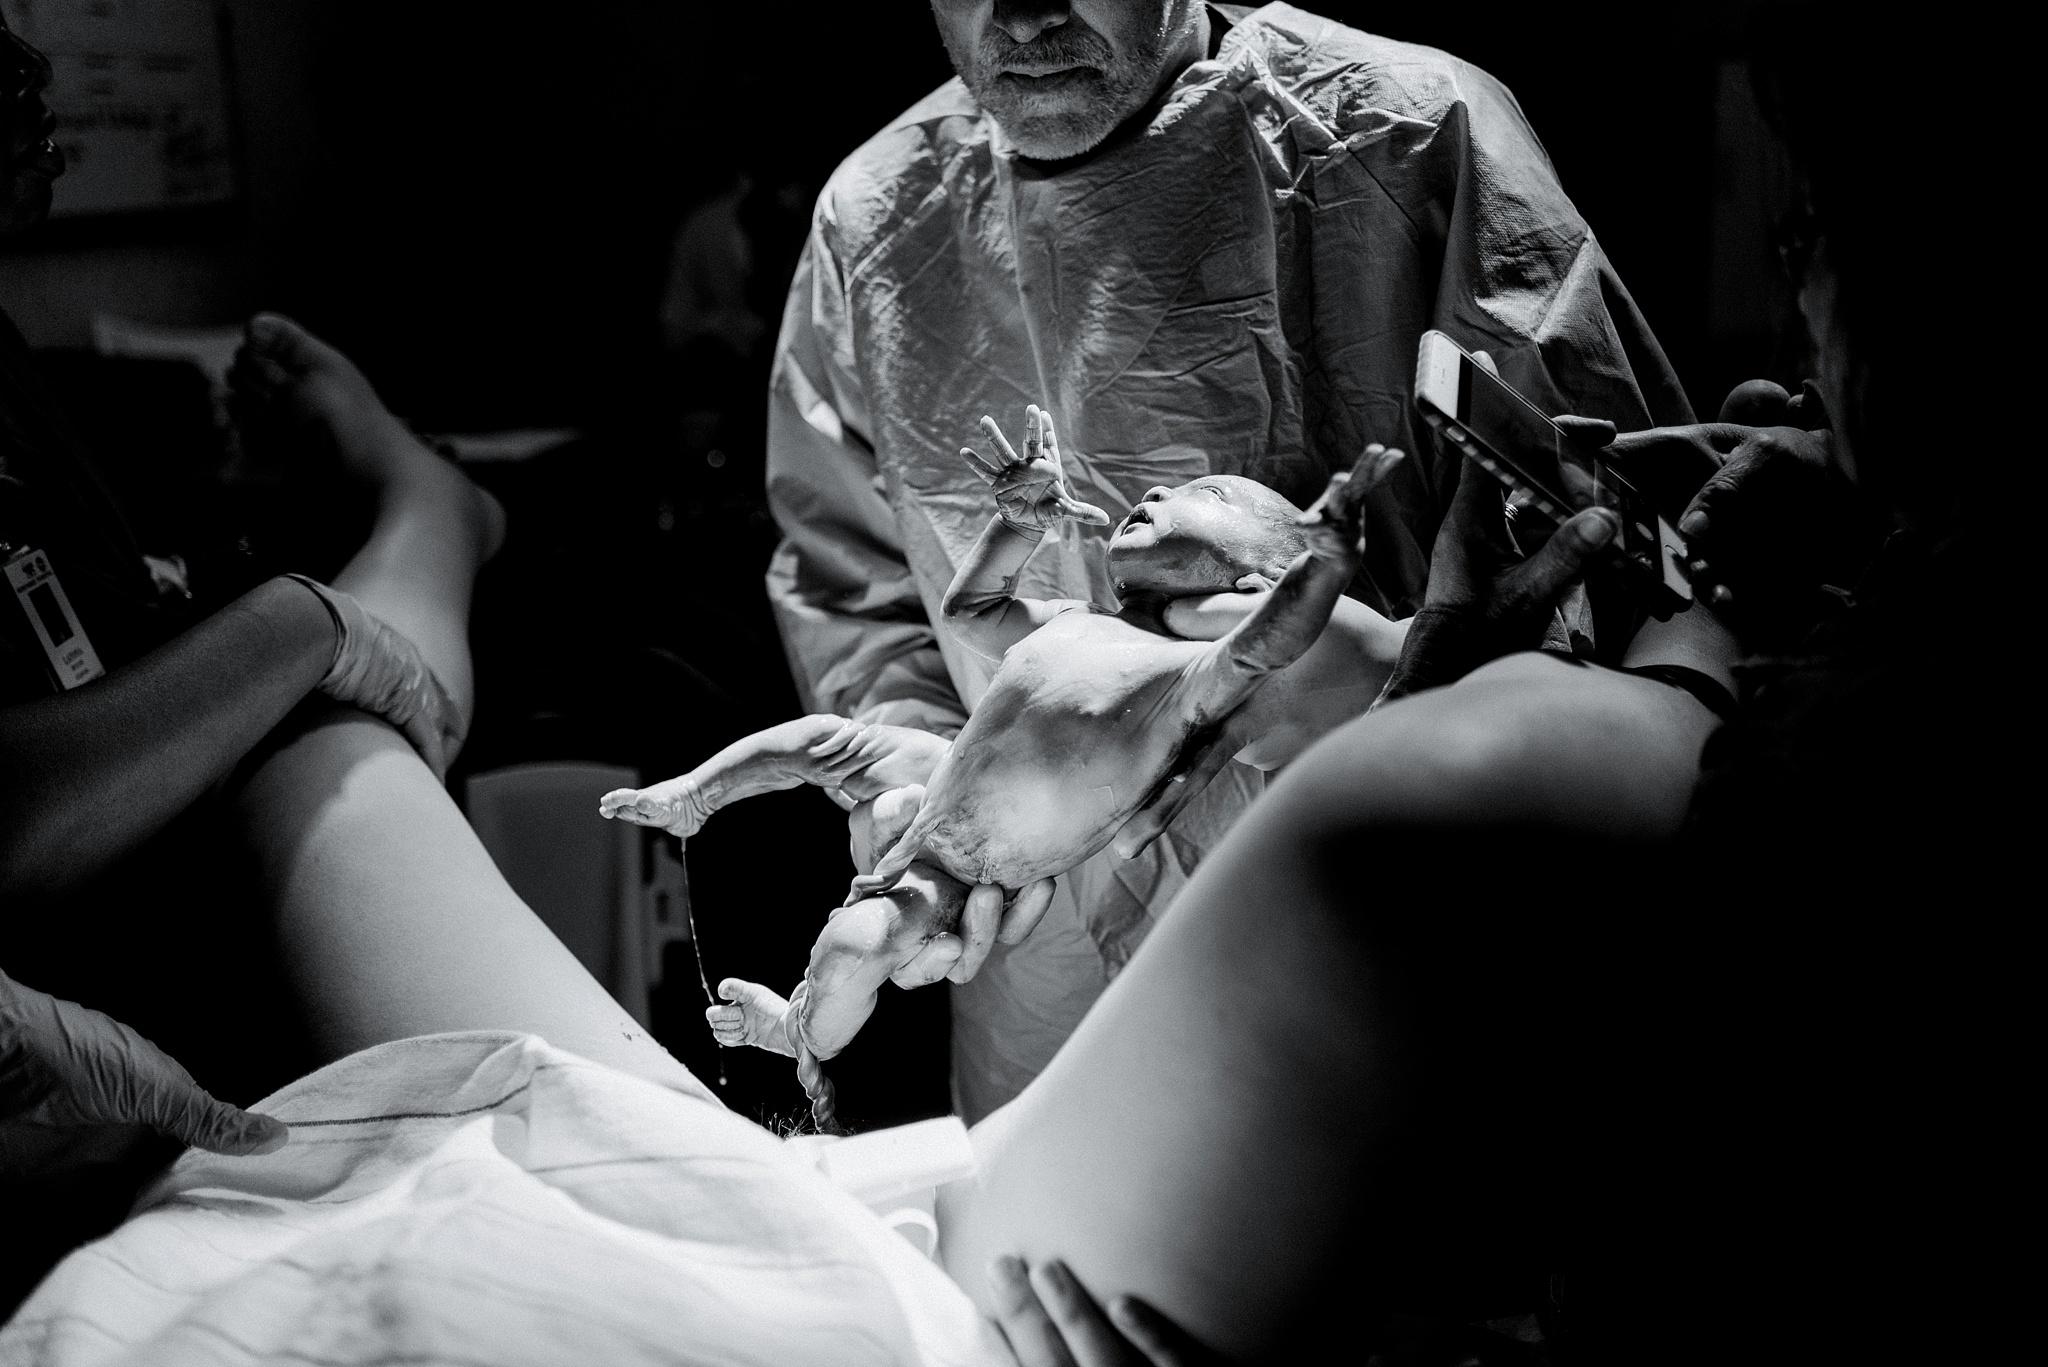 northside-hospital-birth-photographer-ella-mary-claire-92.jpg